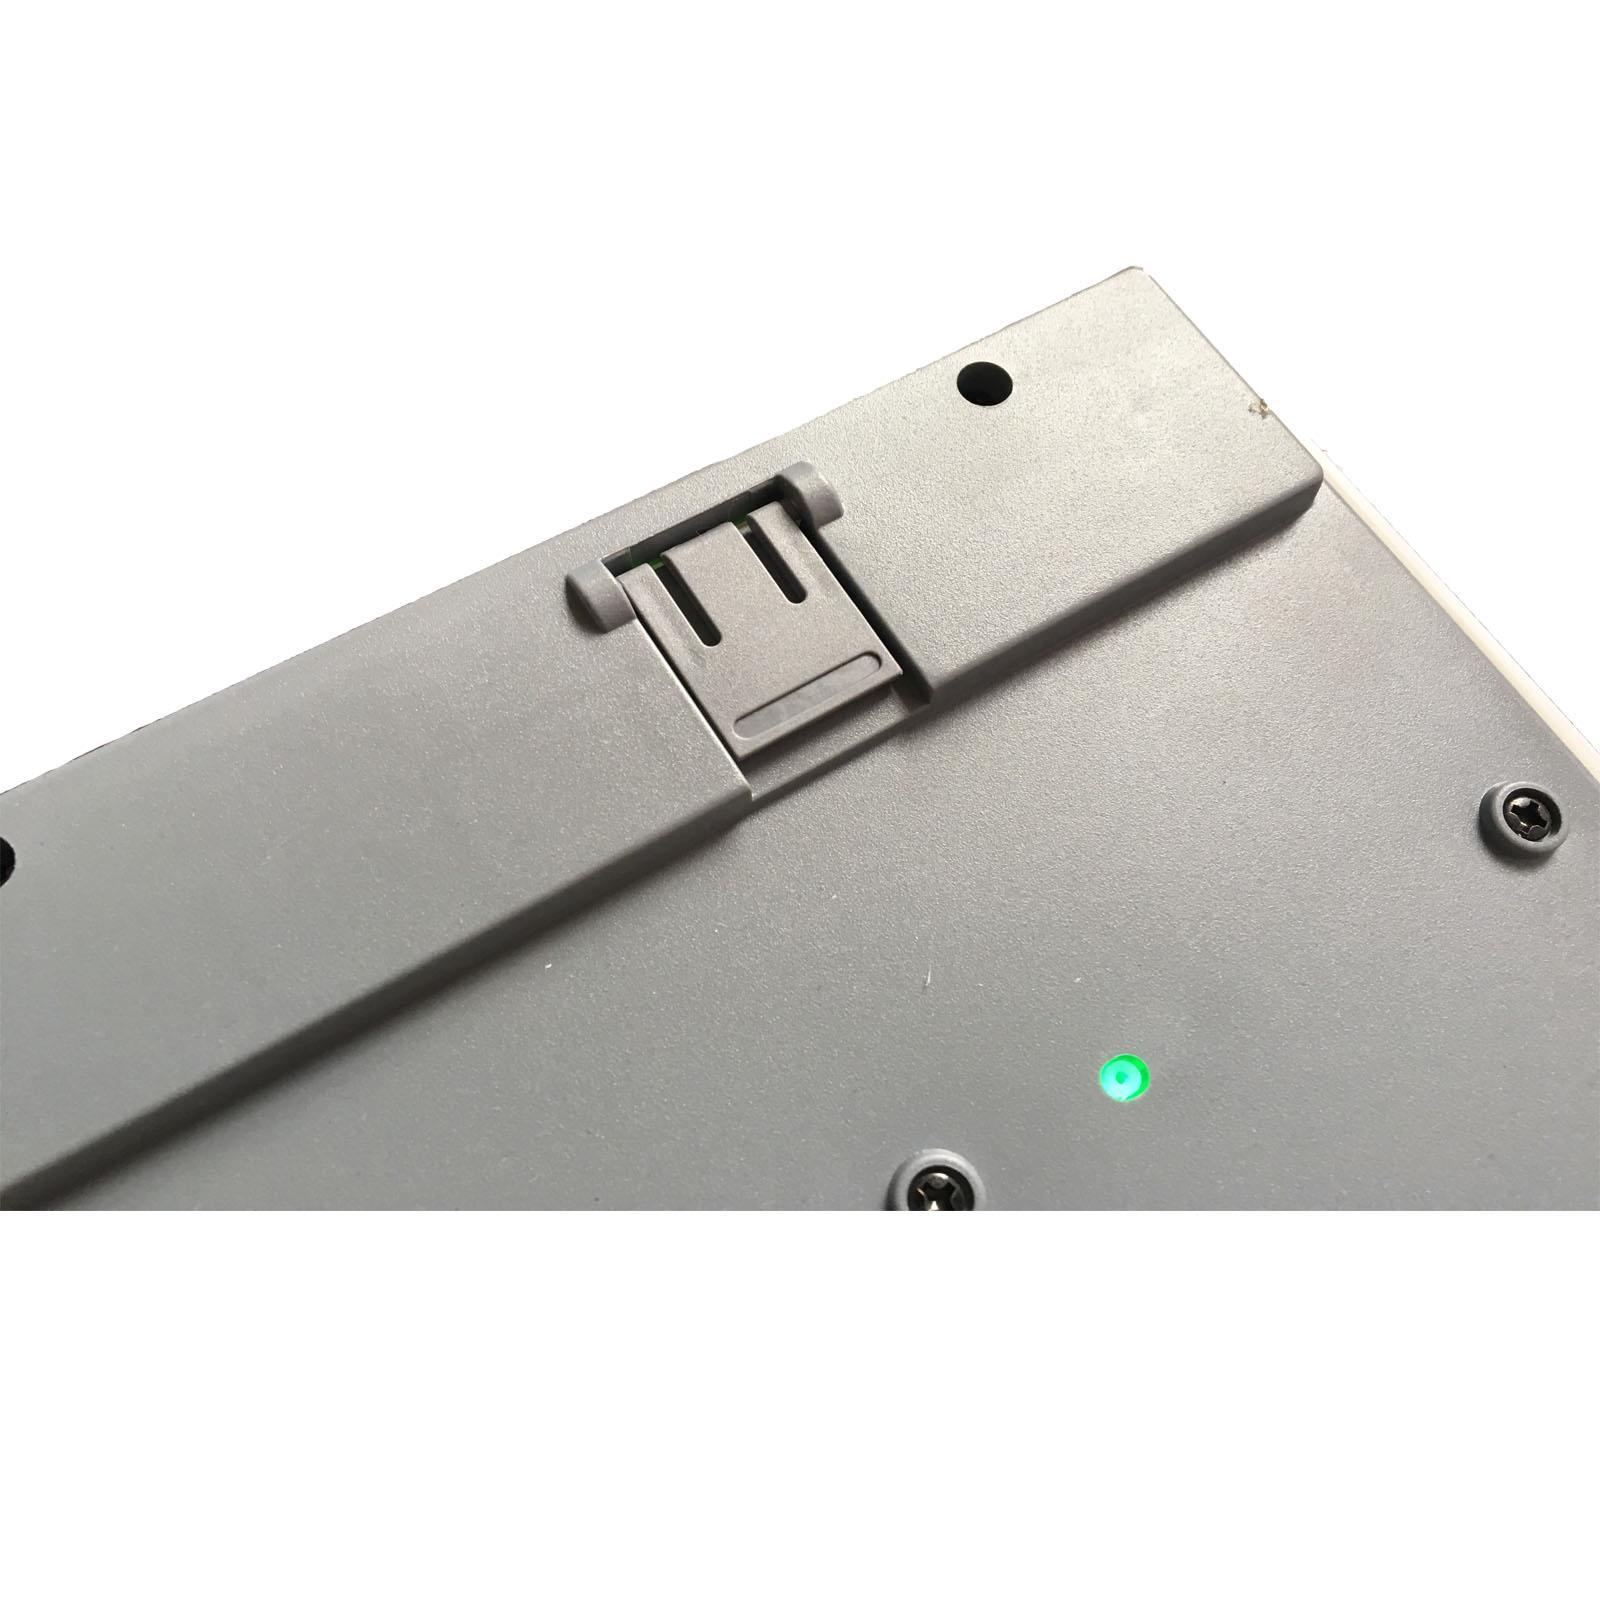 Gaming-Keyboard-Mouse-Backlit-Rainbow-LED-USB-Set-for-PC-Laptop-PS4-Xbox-One thumbnail 57